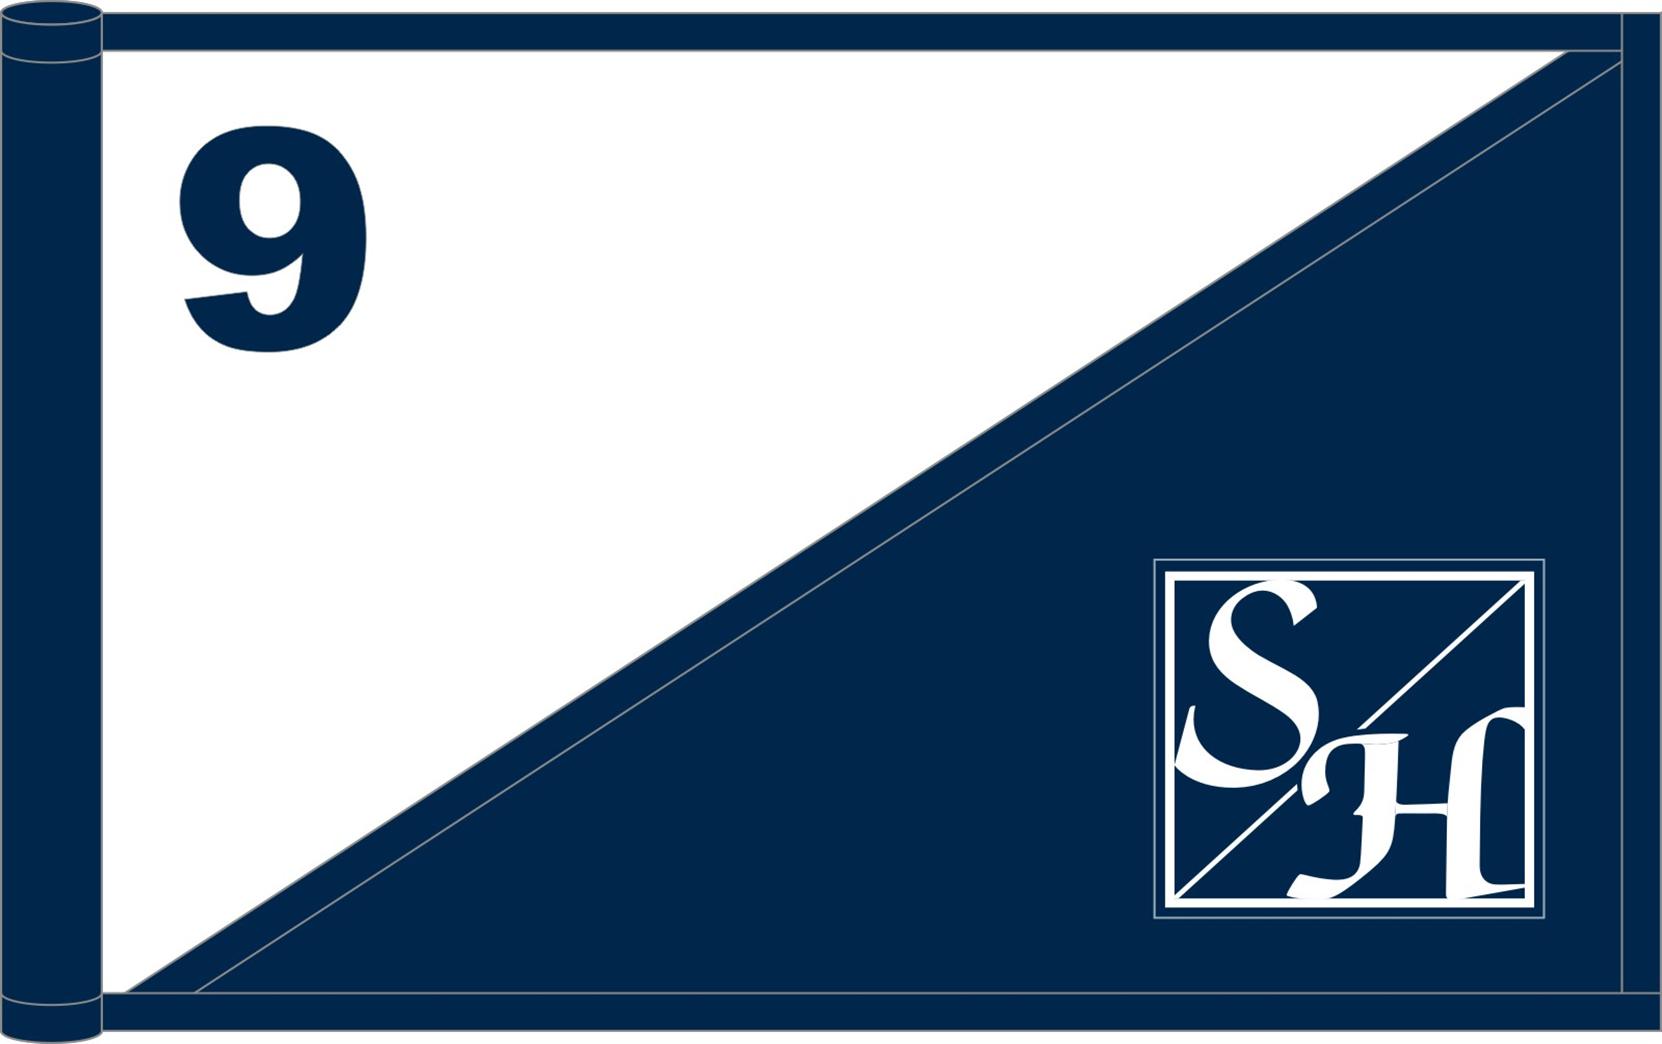 2017 golf flag.png